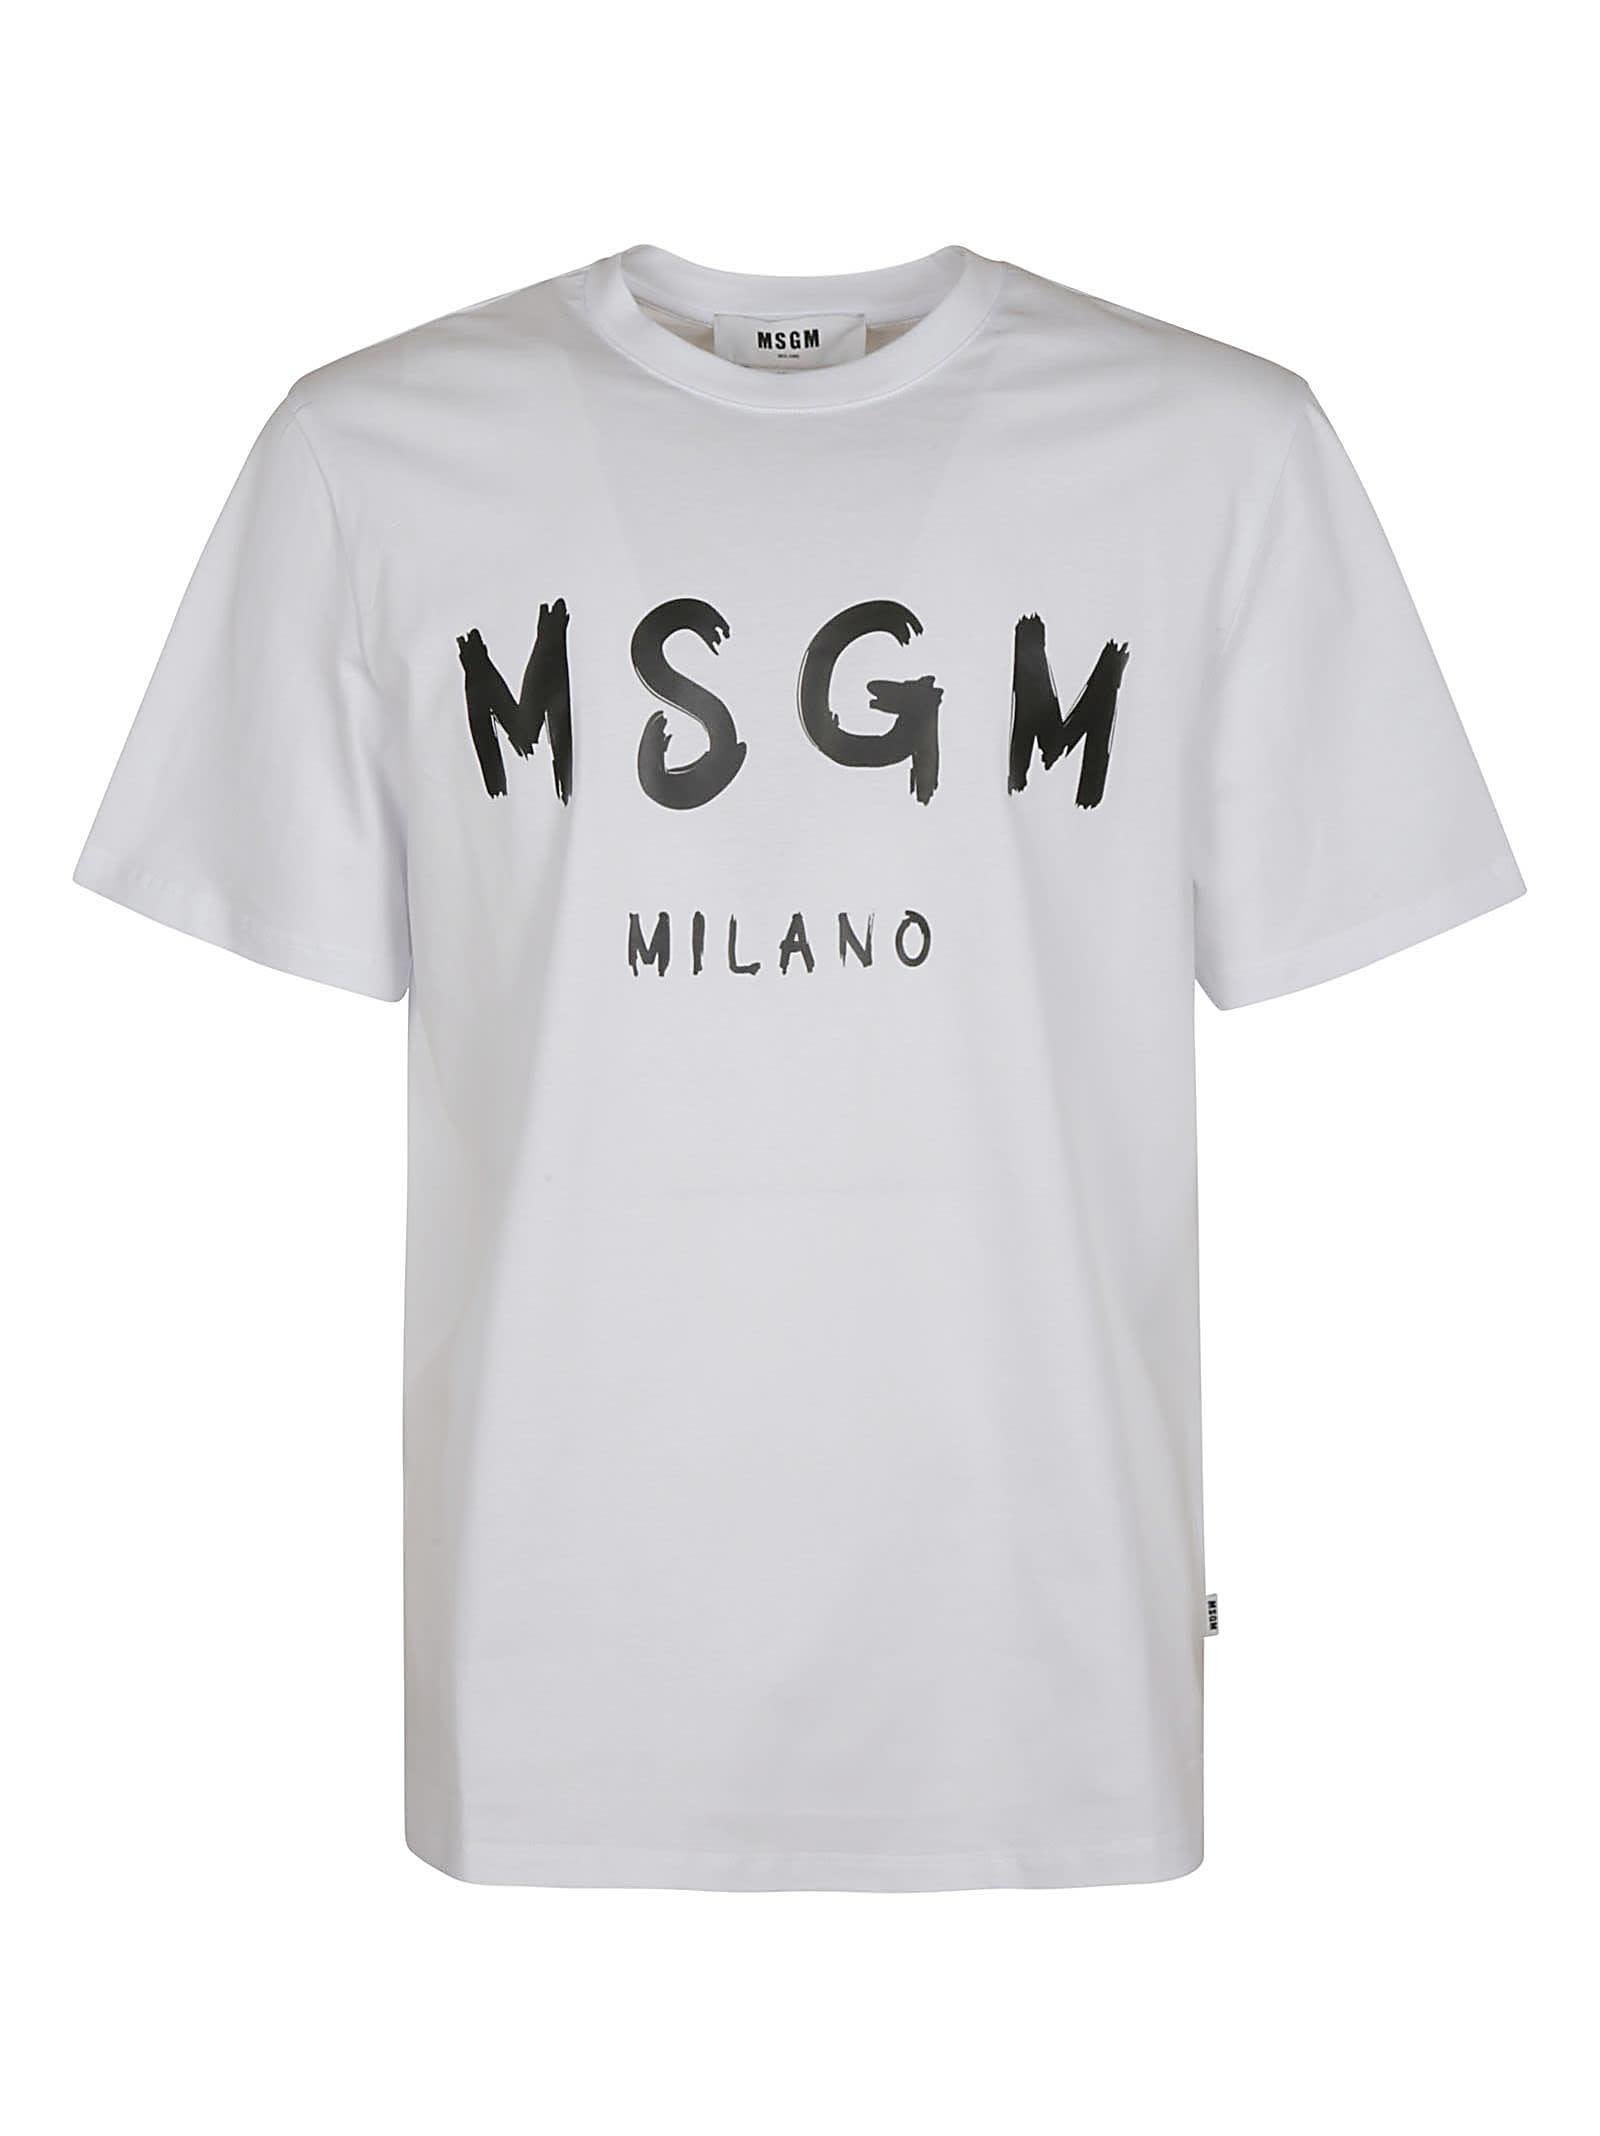 Msgm Cottons MILANO LOGO PRINT T-SHIRT